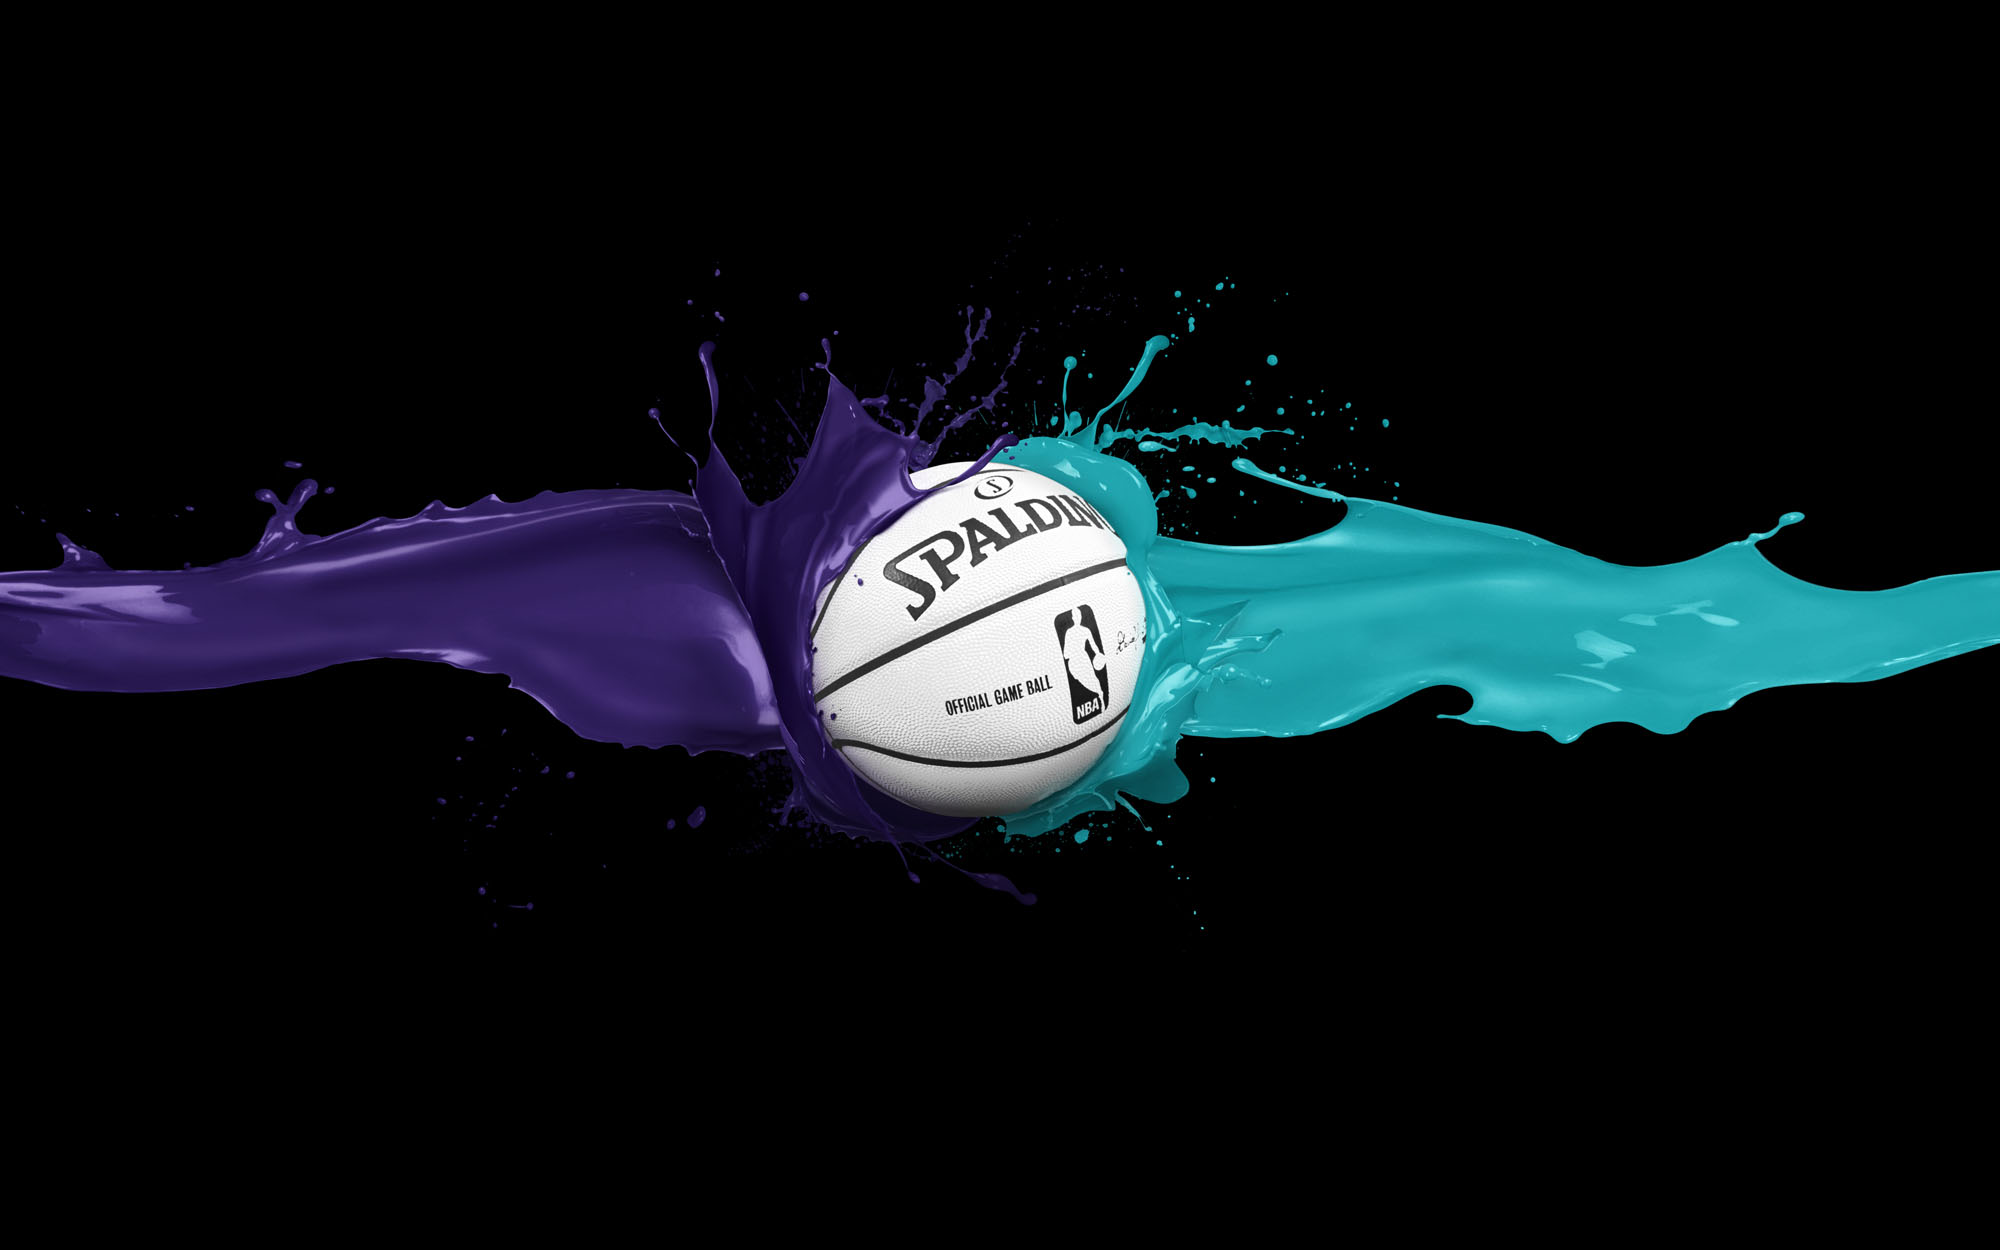 NBA Charlotte Hornets Ball Spalding wallpaper 2018 in Basketball 2000x1250